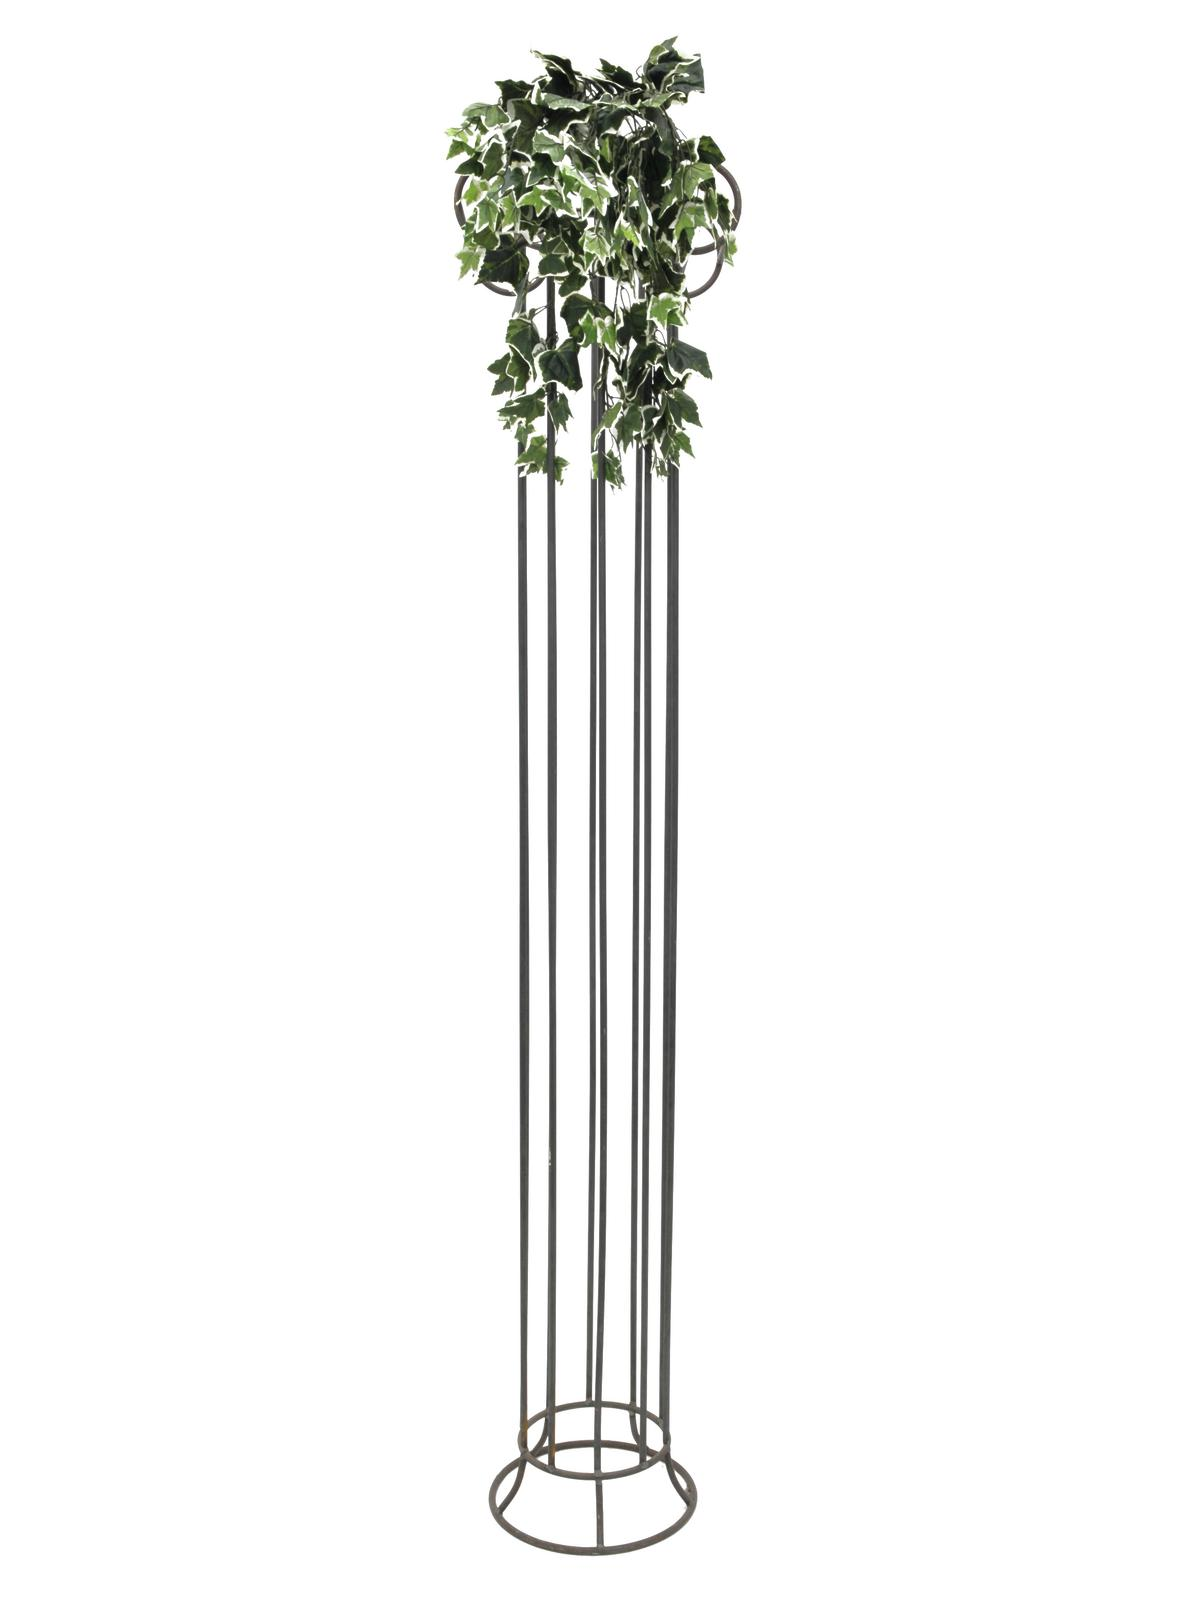 EUROPALMS olandese ivy bush, 60cm